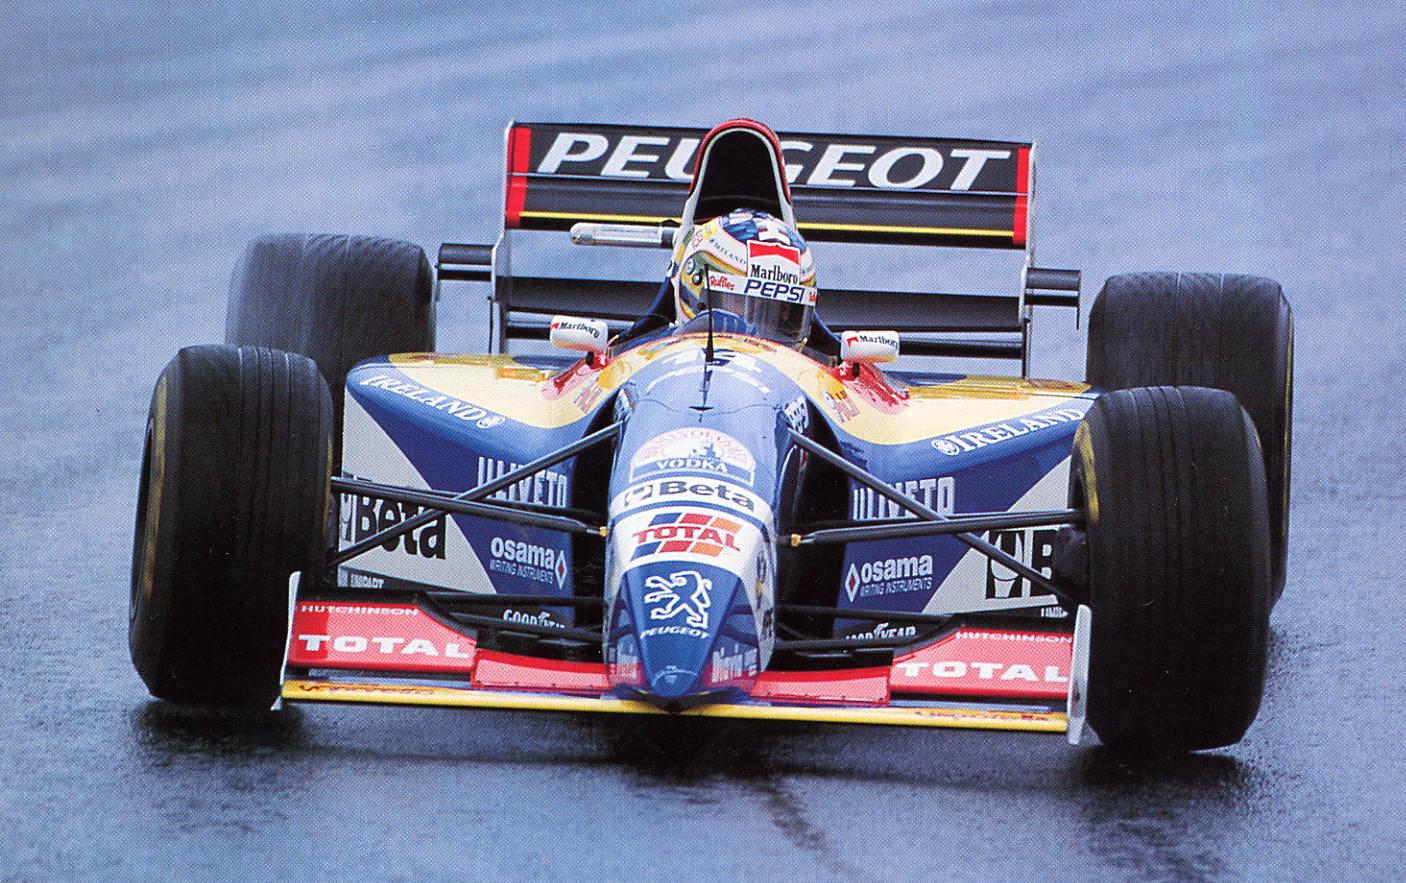 Rubens Barrichello Jordan 195 1995 One Image F1